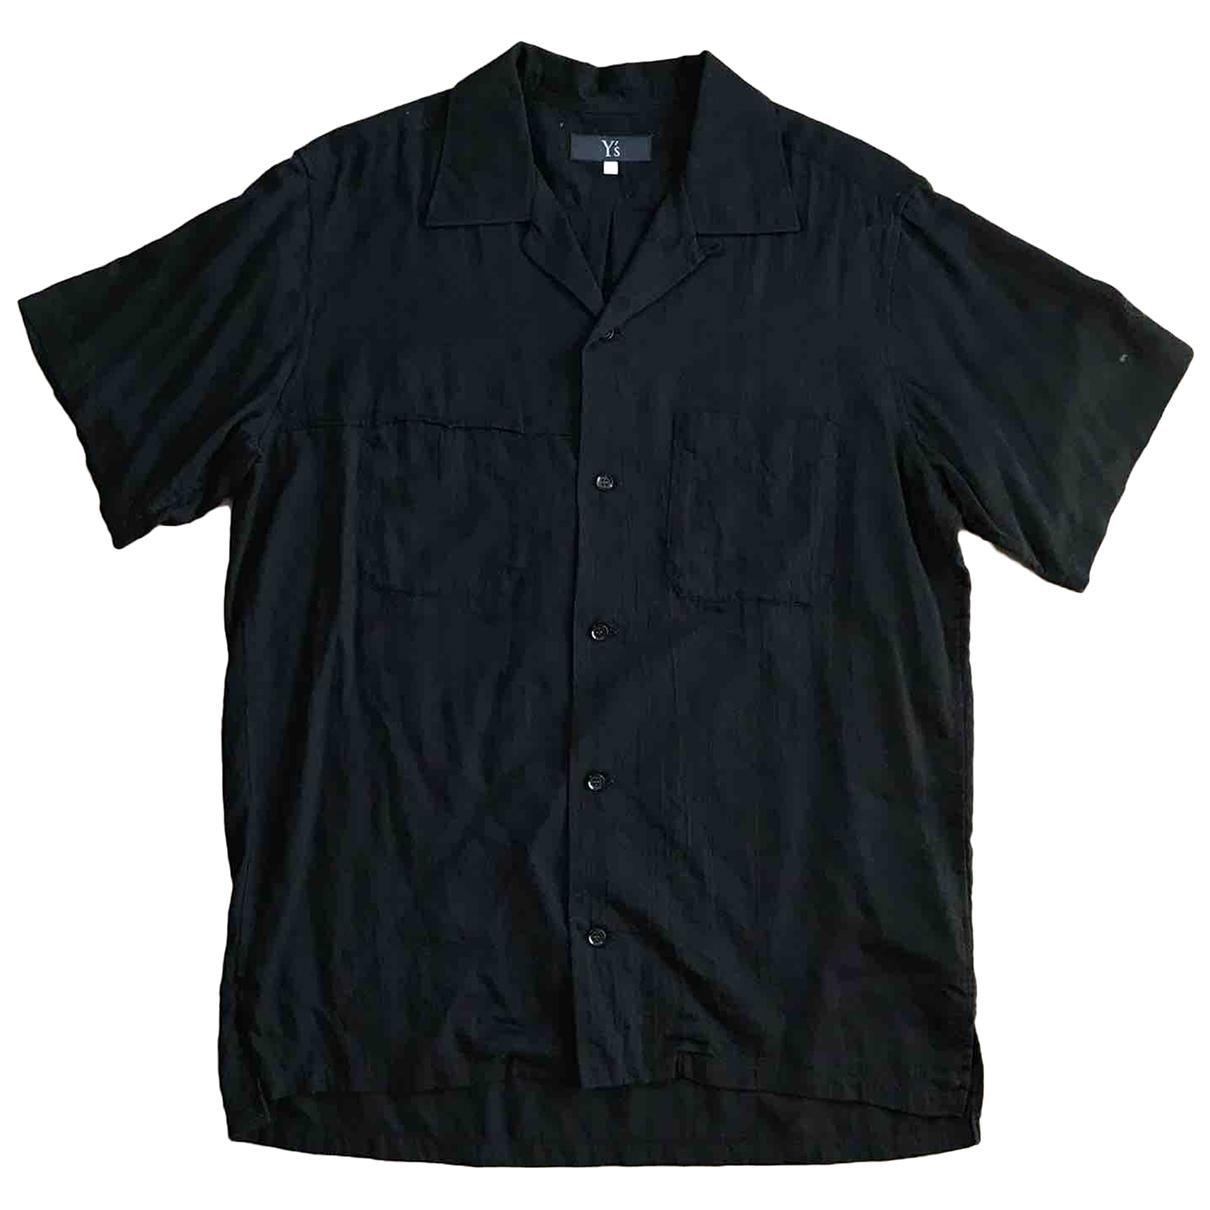 Yohji Yamamoto \N Black Cotton Shirts for Men S International